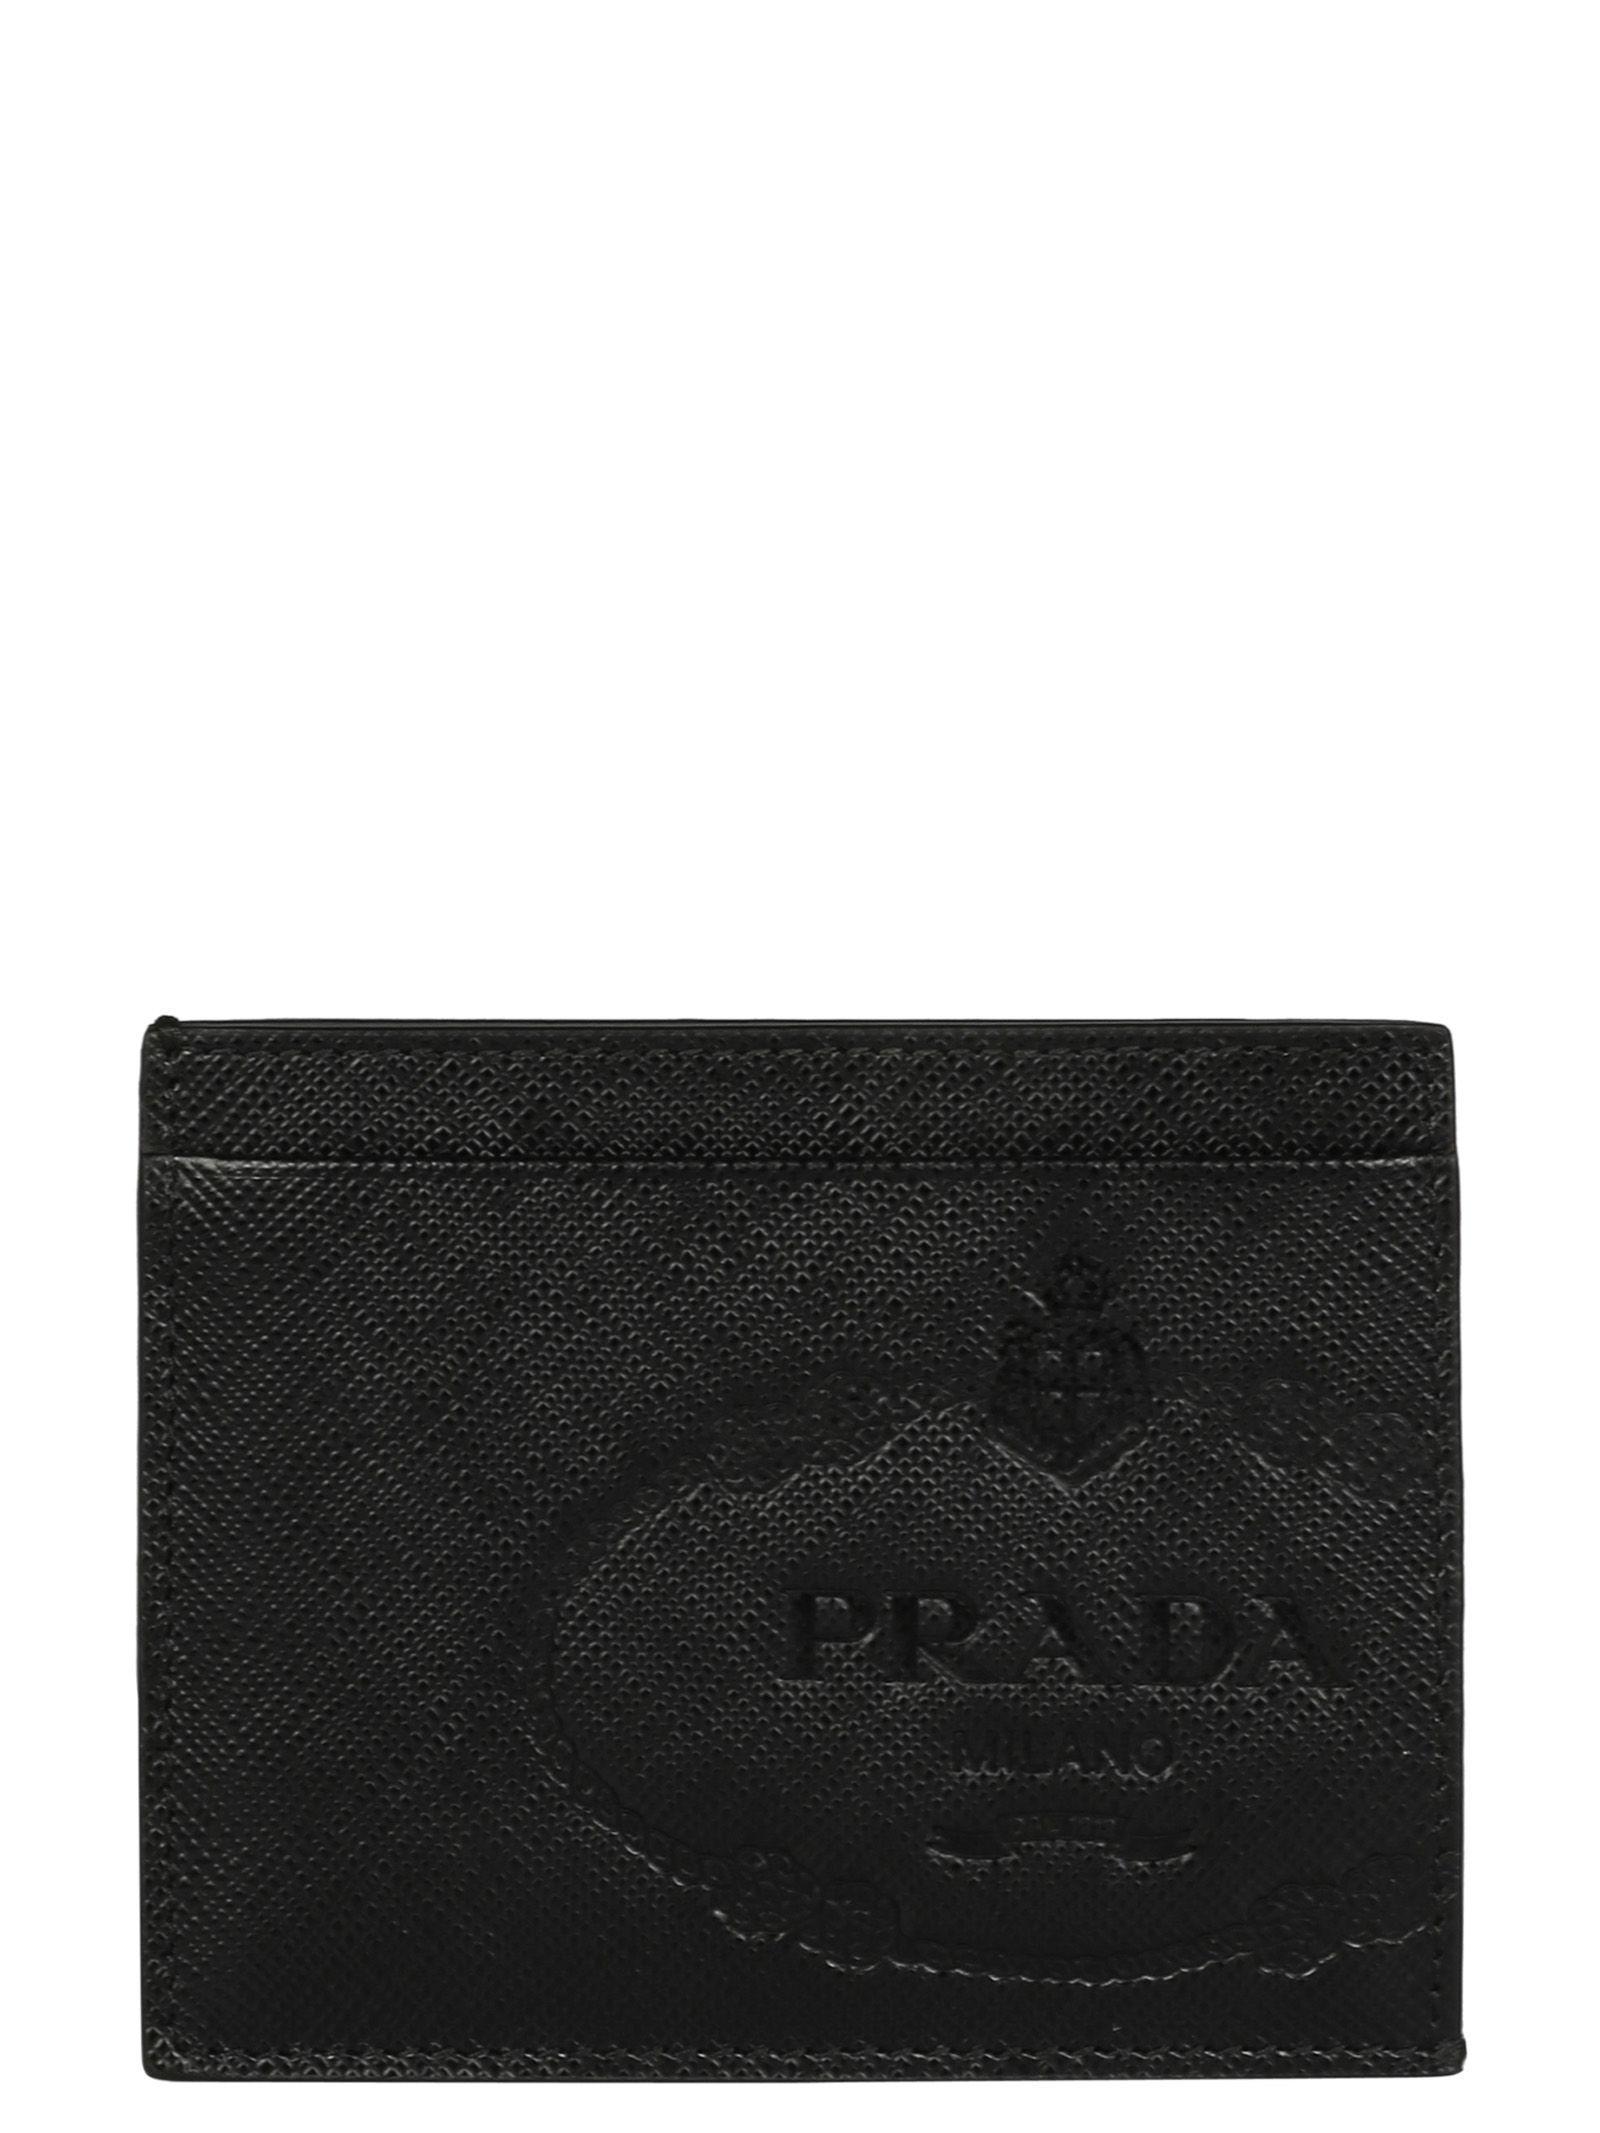 452beab0a742c5 Prada Logo-Debossed Saffiano-Leather Cardholder In Black | ModeSens